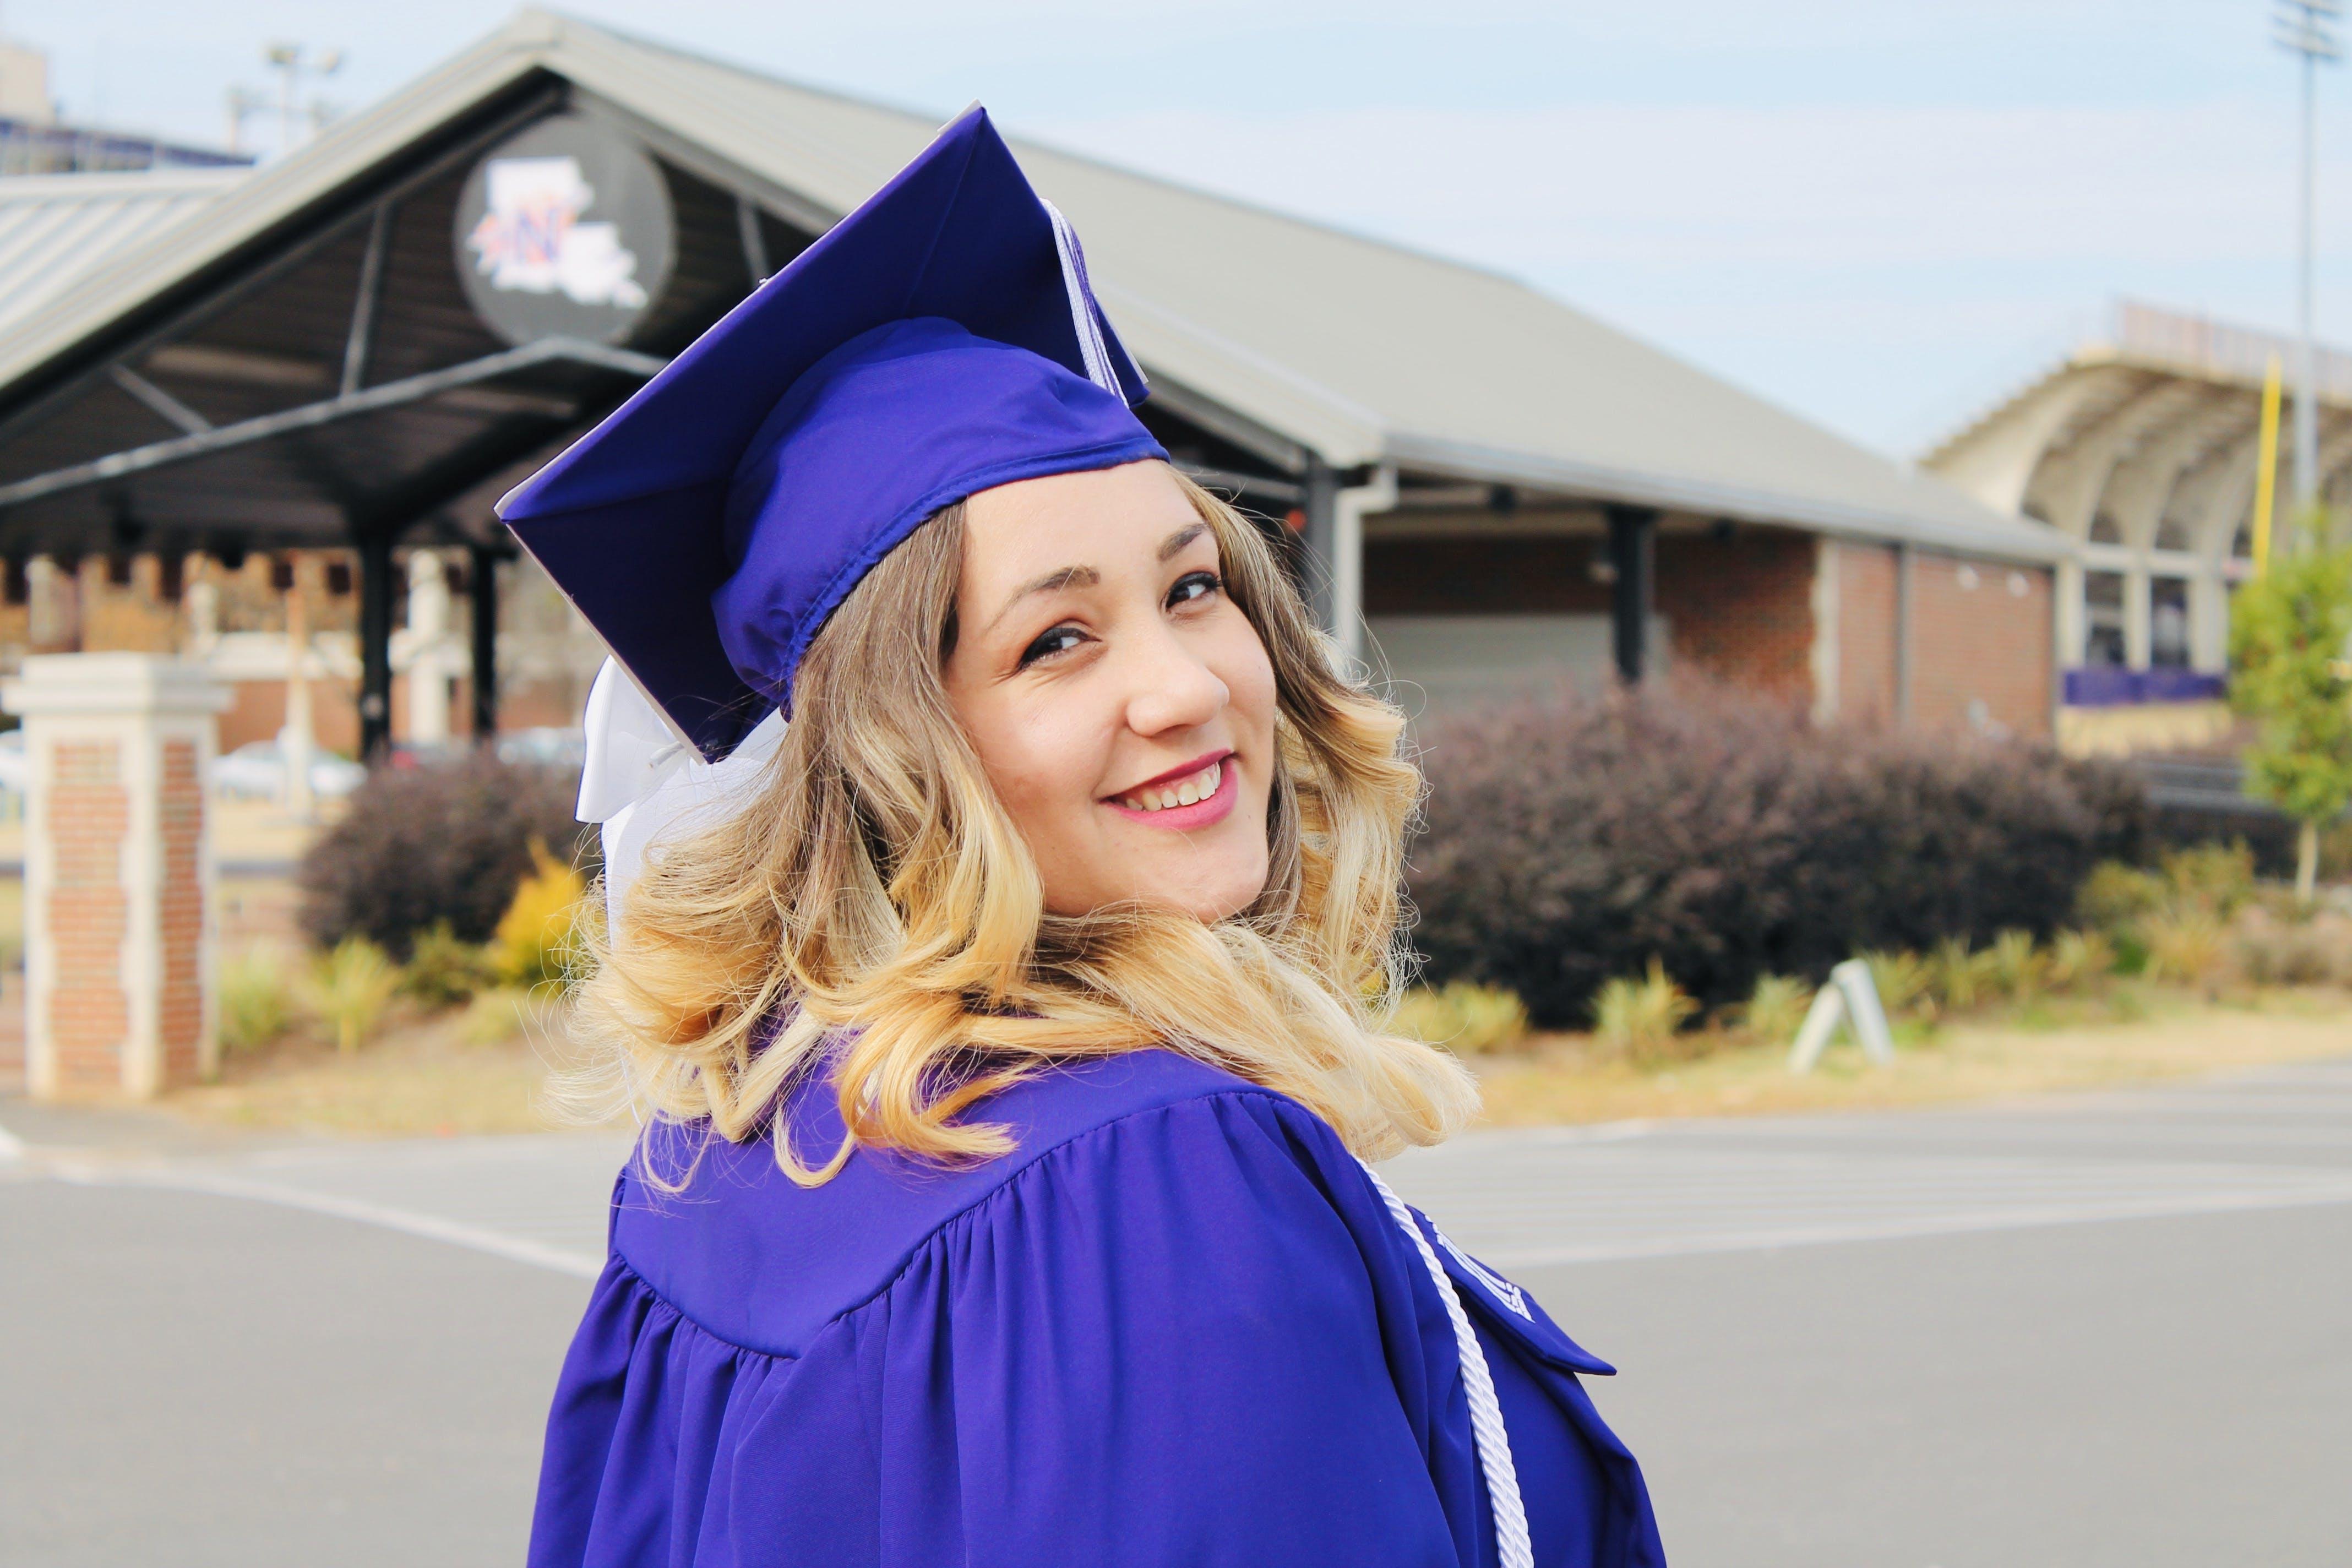 Woman Wearing Purple Mortar Board and Academic Robe